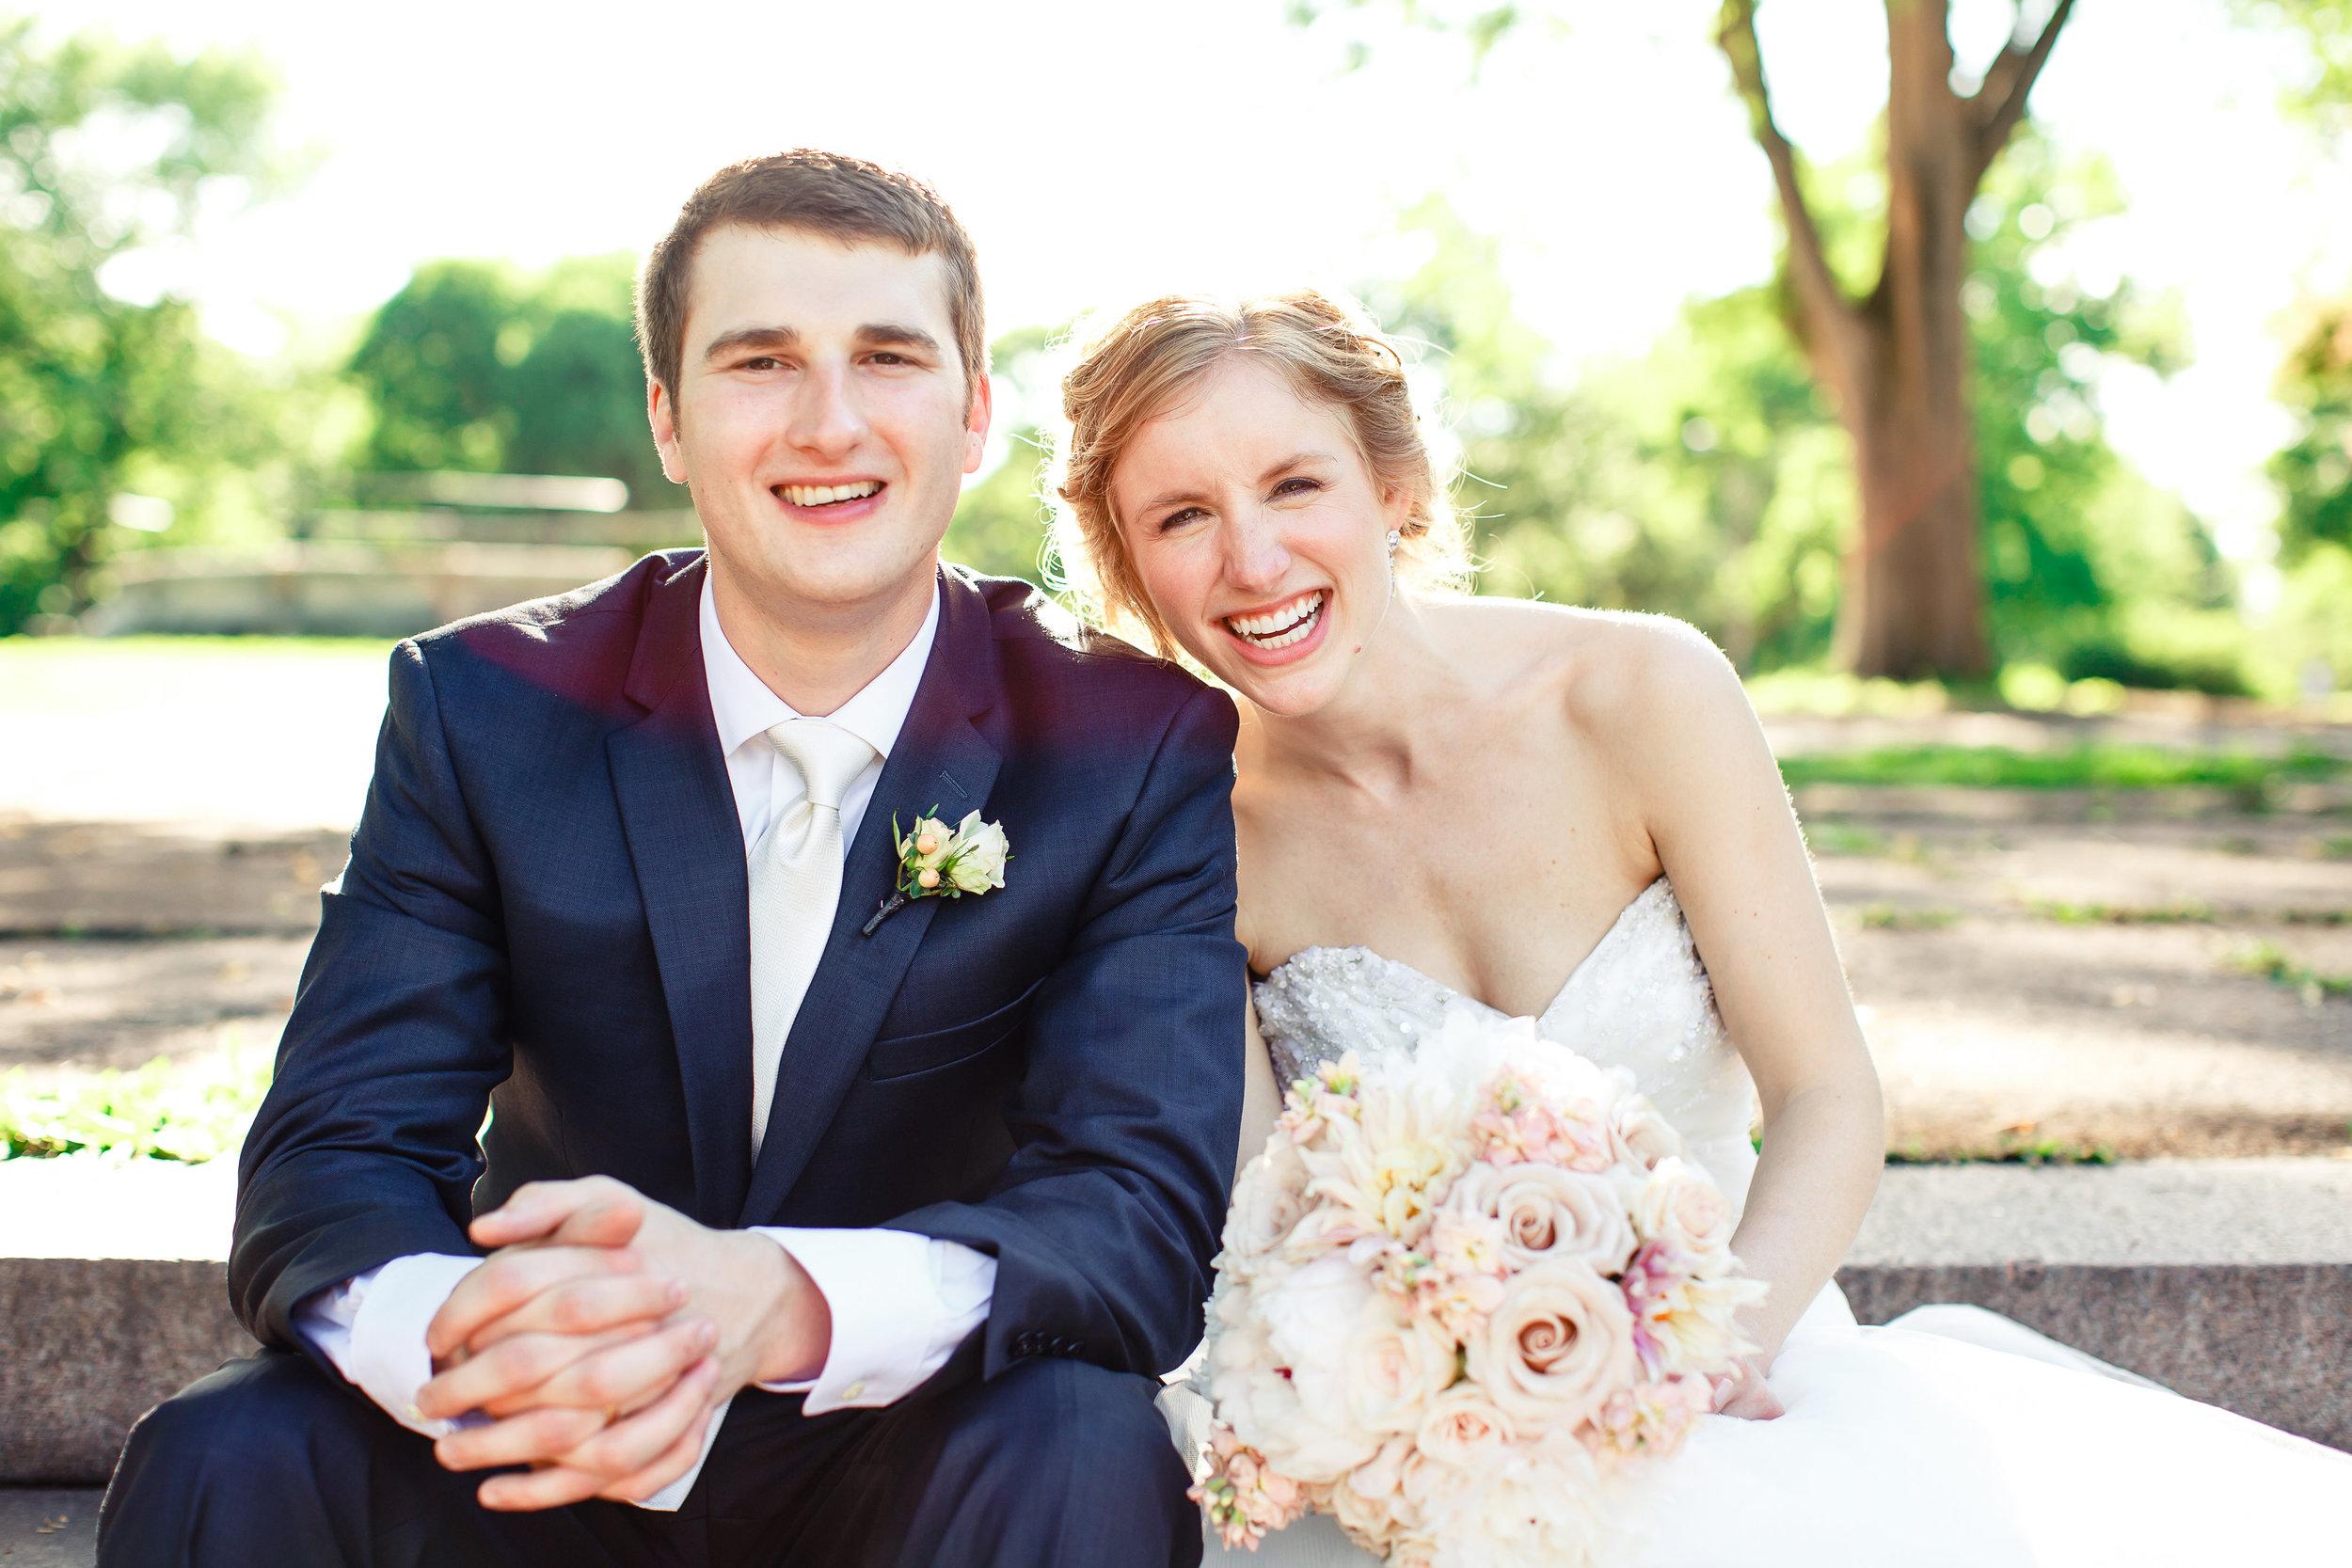 Lafayette Square Park St. Louis Wedding Photographer Oldani Photography 9.jpg